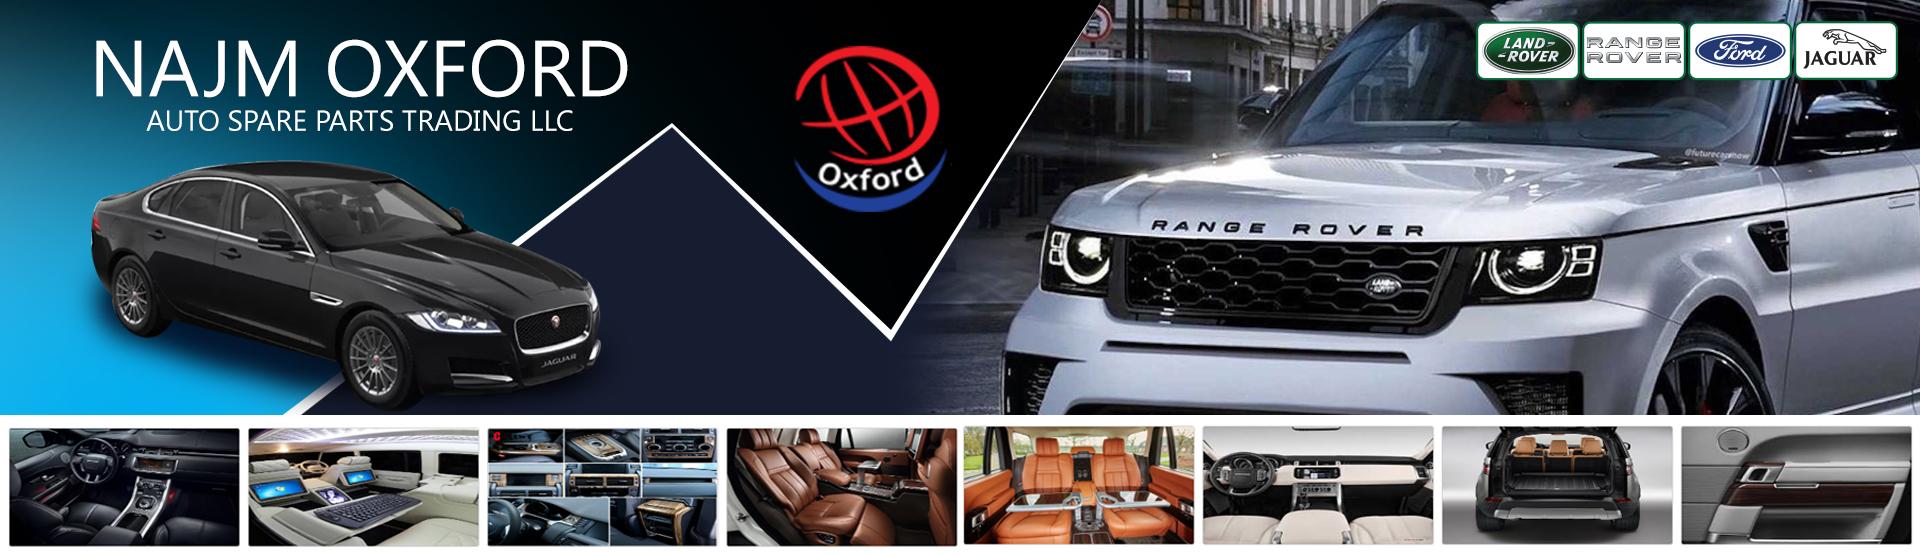 NAJM OXFORD AUTO SPARE PARTS TRADING LLC